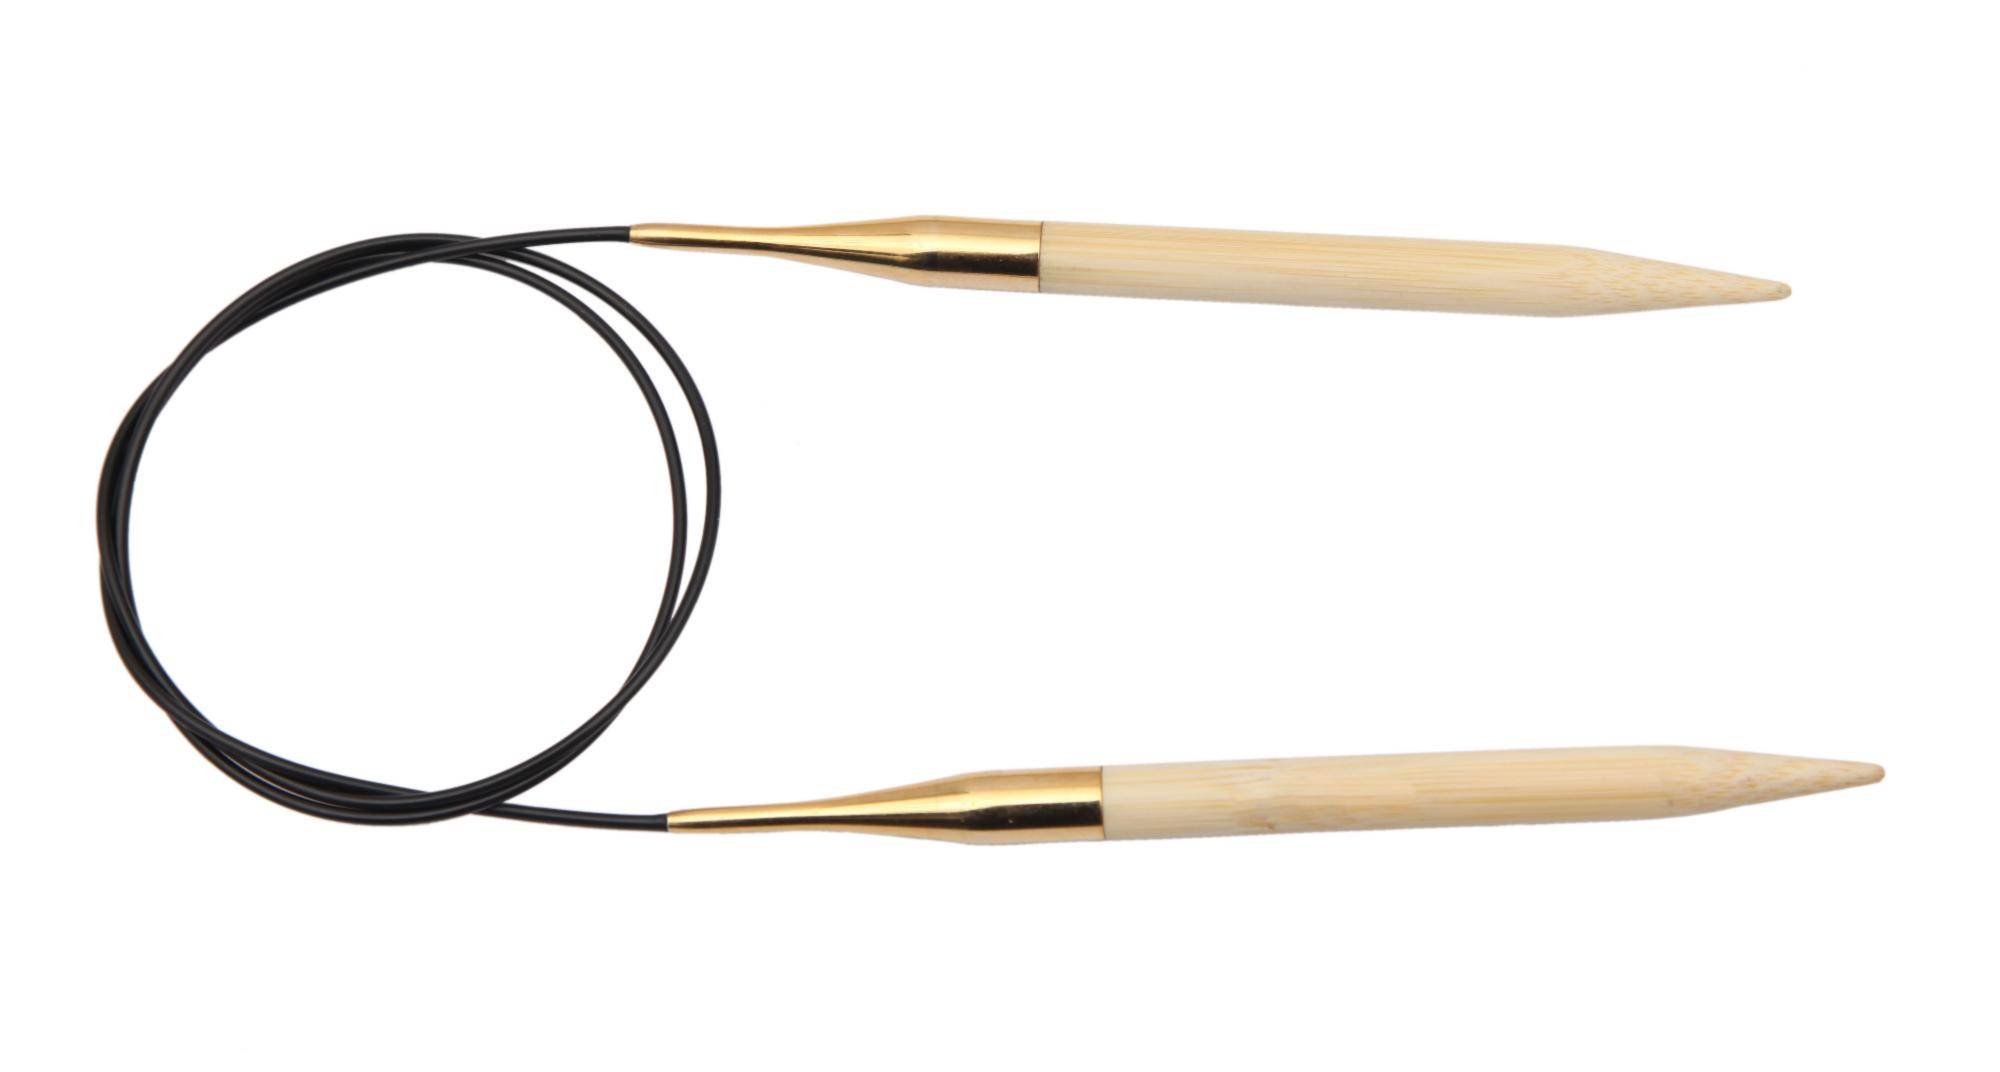 Спицы круговые 40 см Bamboo KnitPro, 22208, 4.50 мм